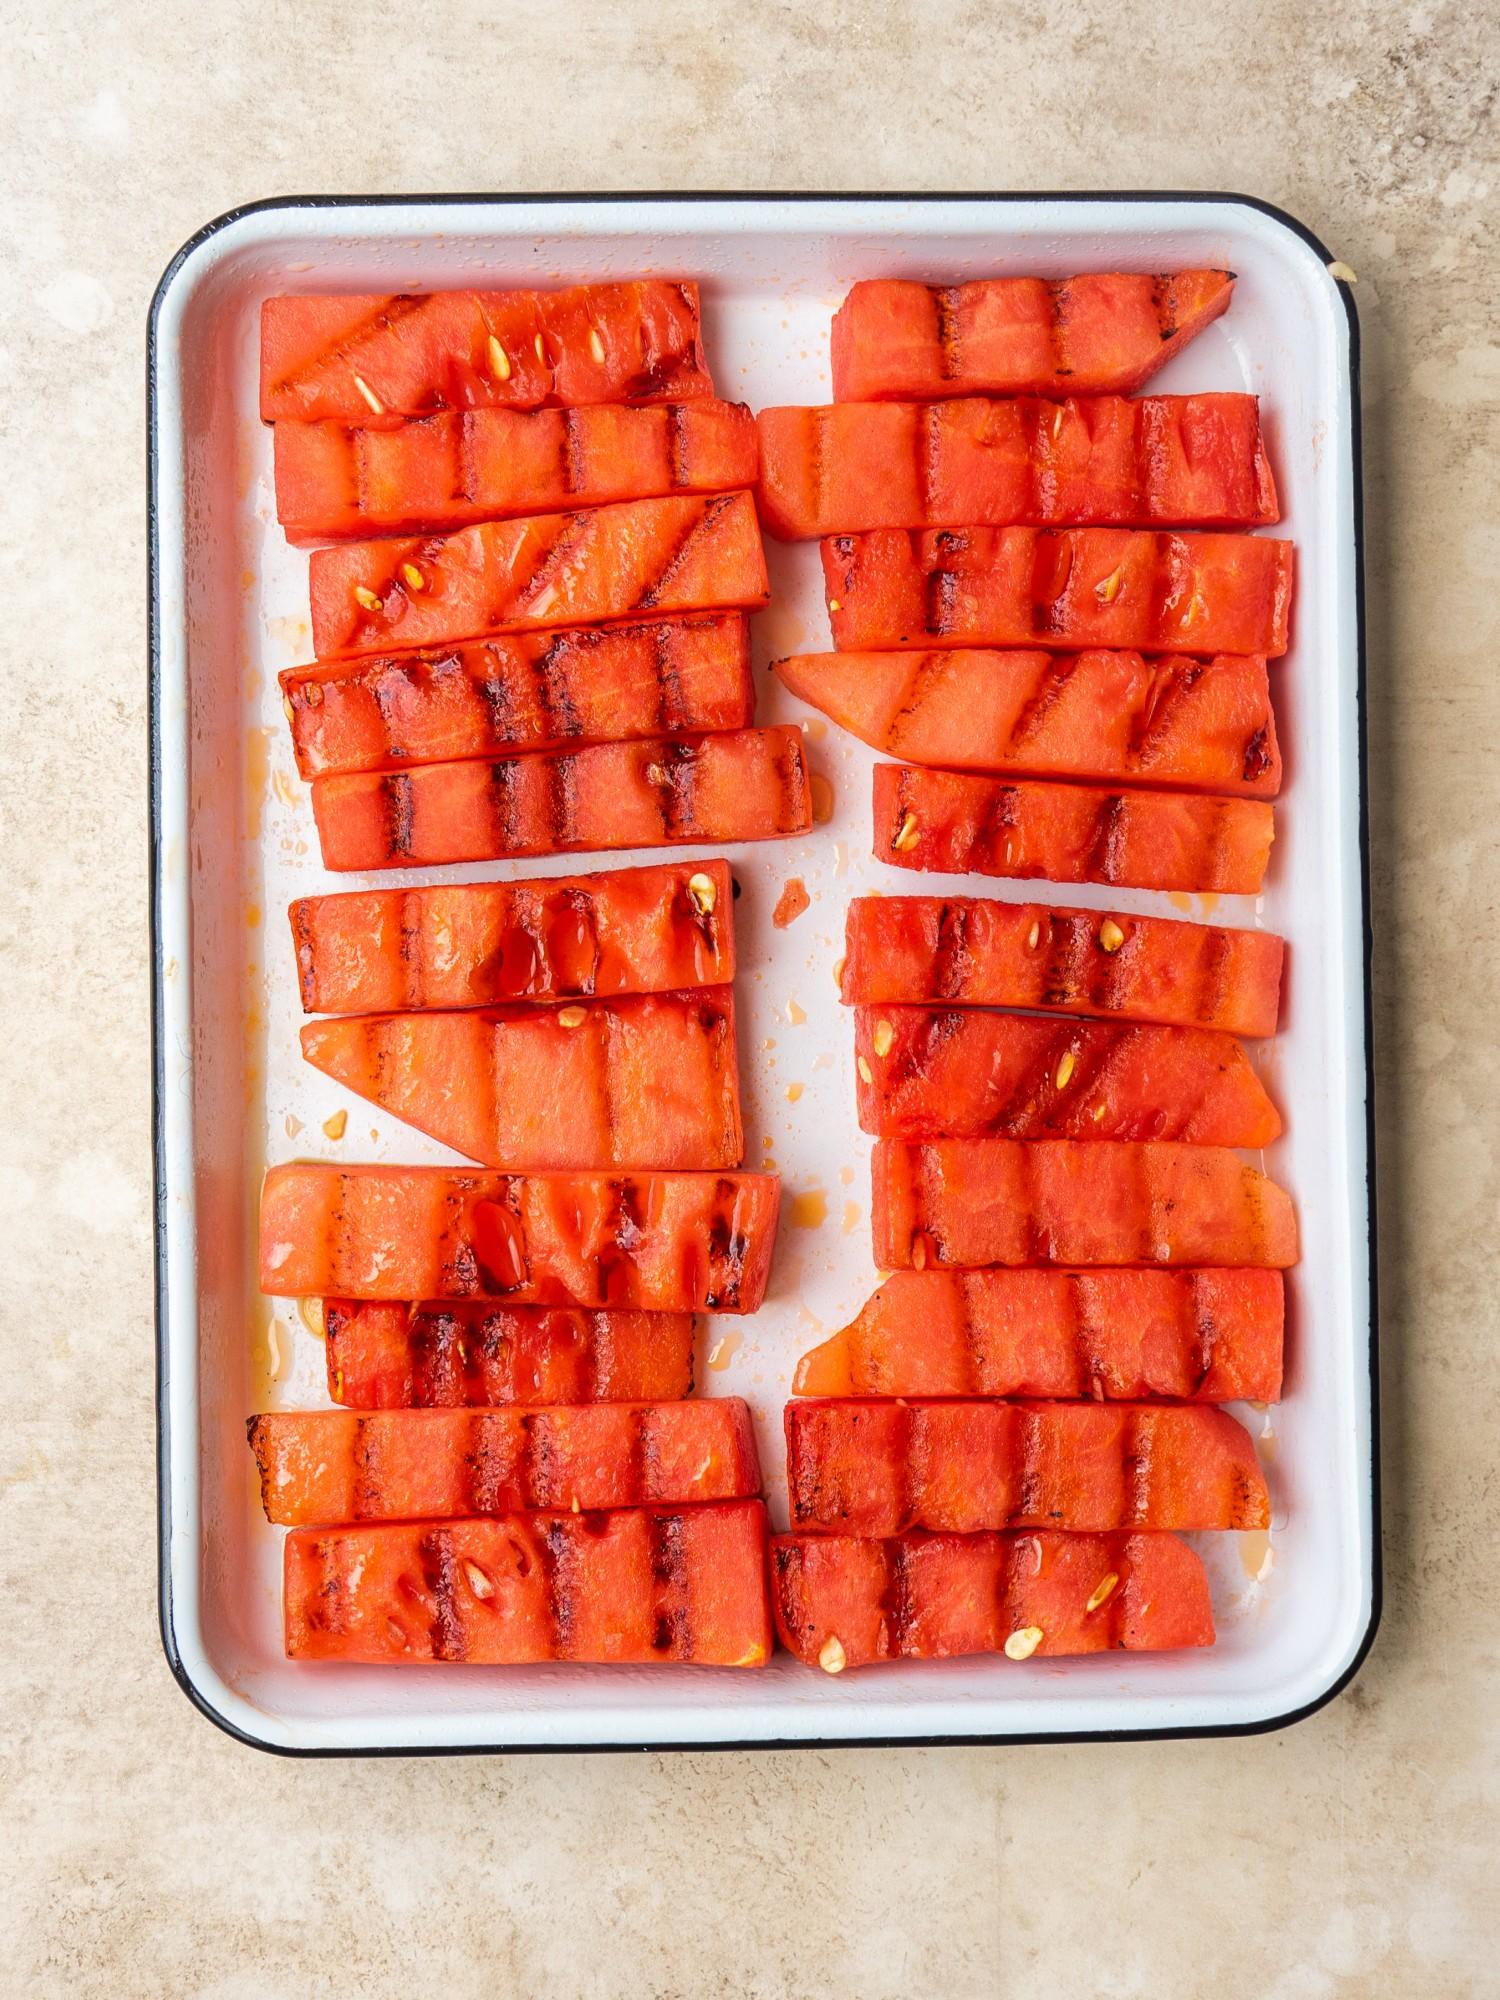 BBQ watermelon sticks on a sheet pan